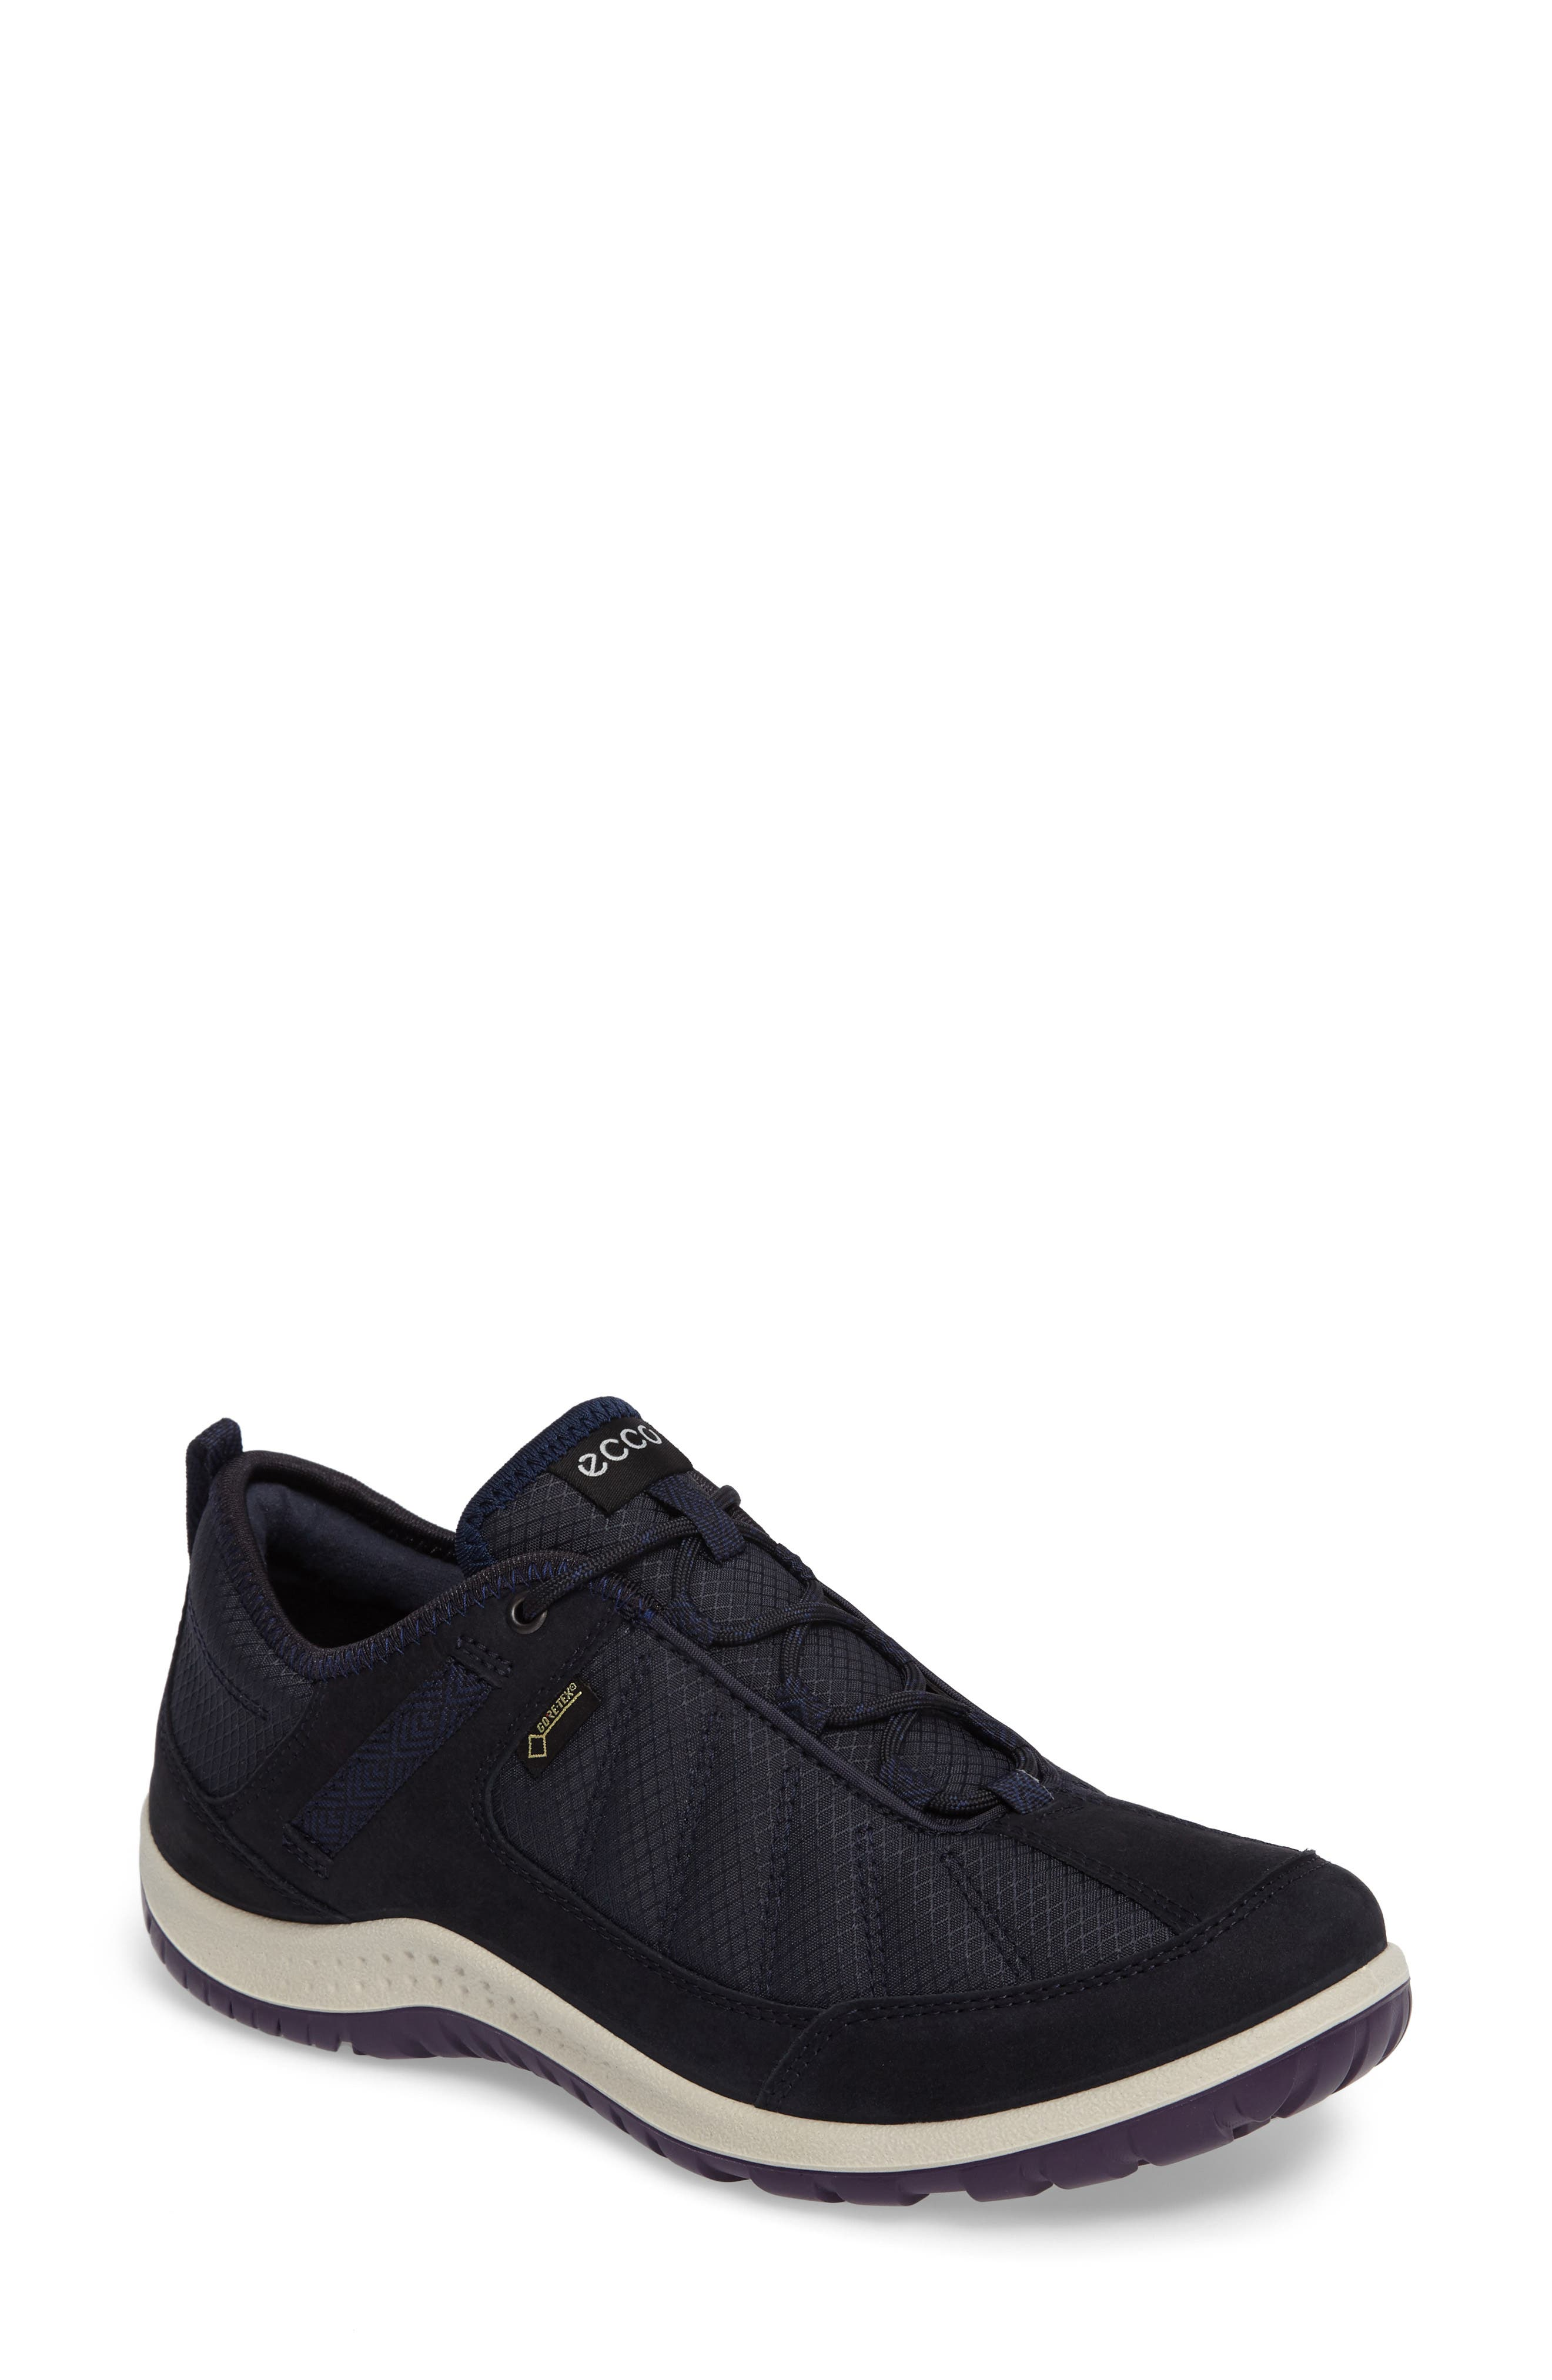 Aspina GTX Waterproof Sneaker,                             Main thumbnail 1, color,                             Navy Leather